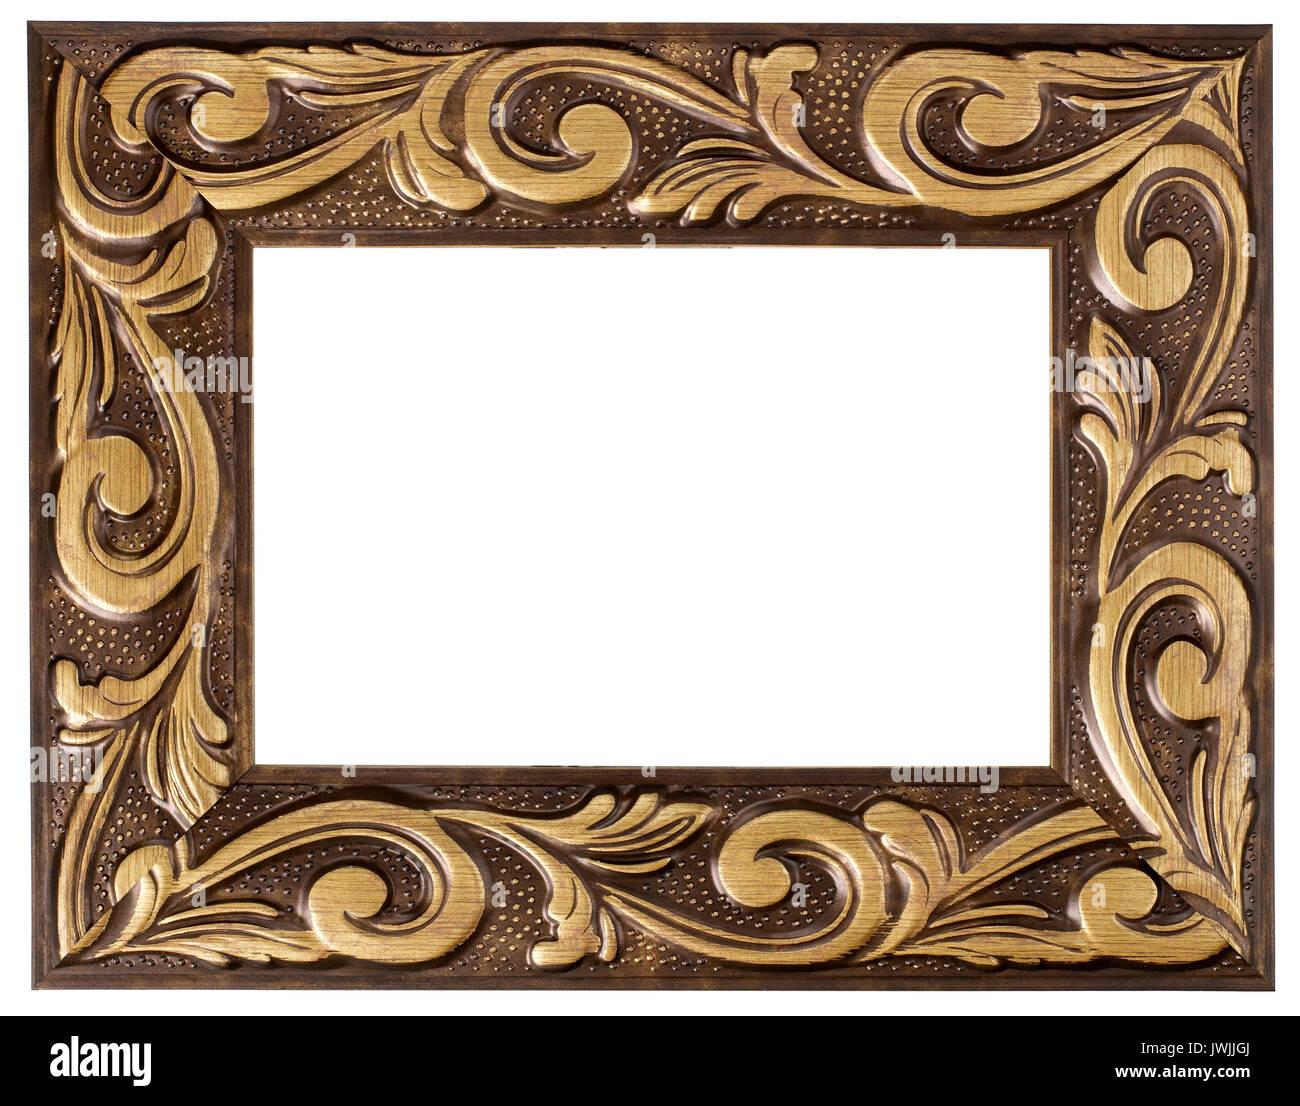 gold bemalt bilderrahmen stockfoto, bild: 153459058 - alamy